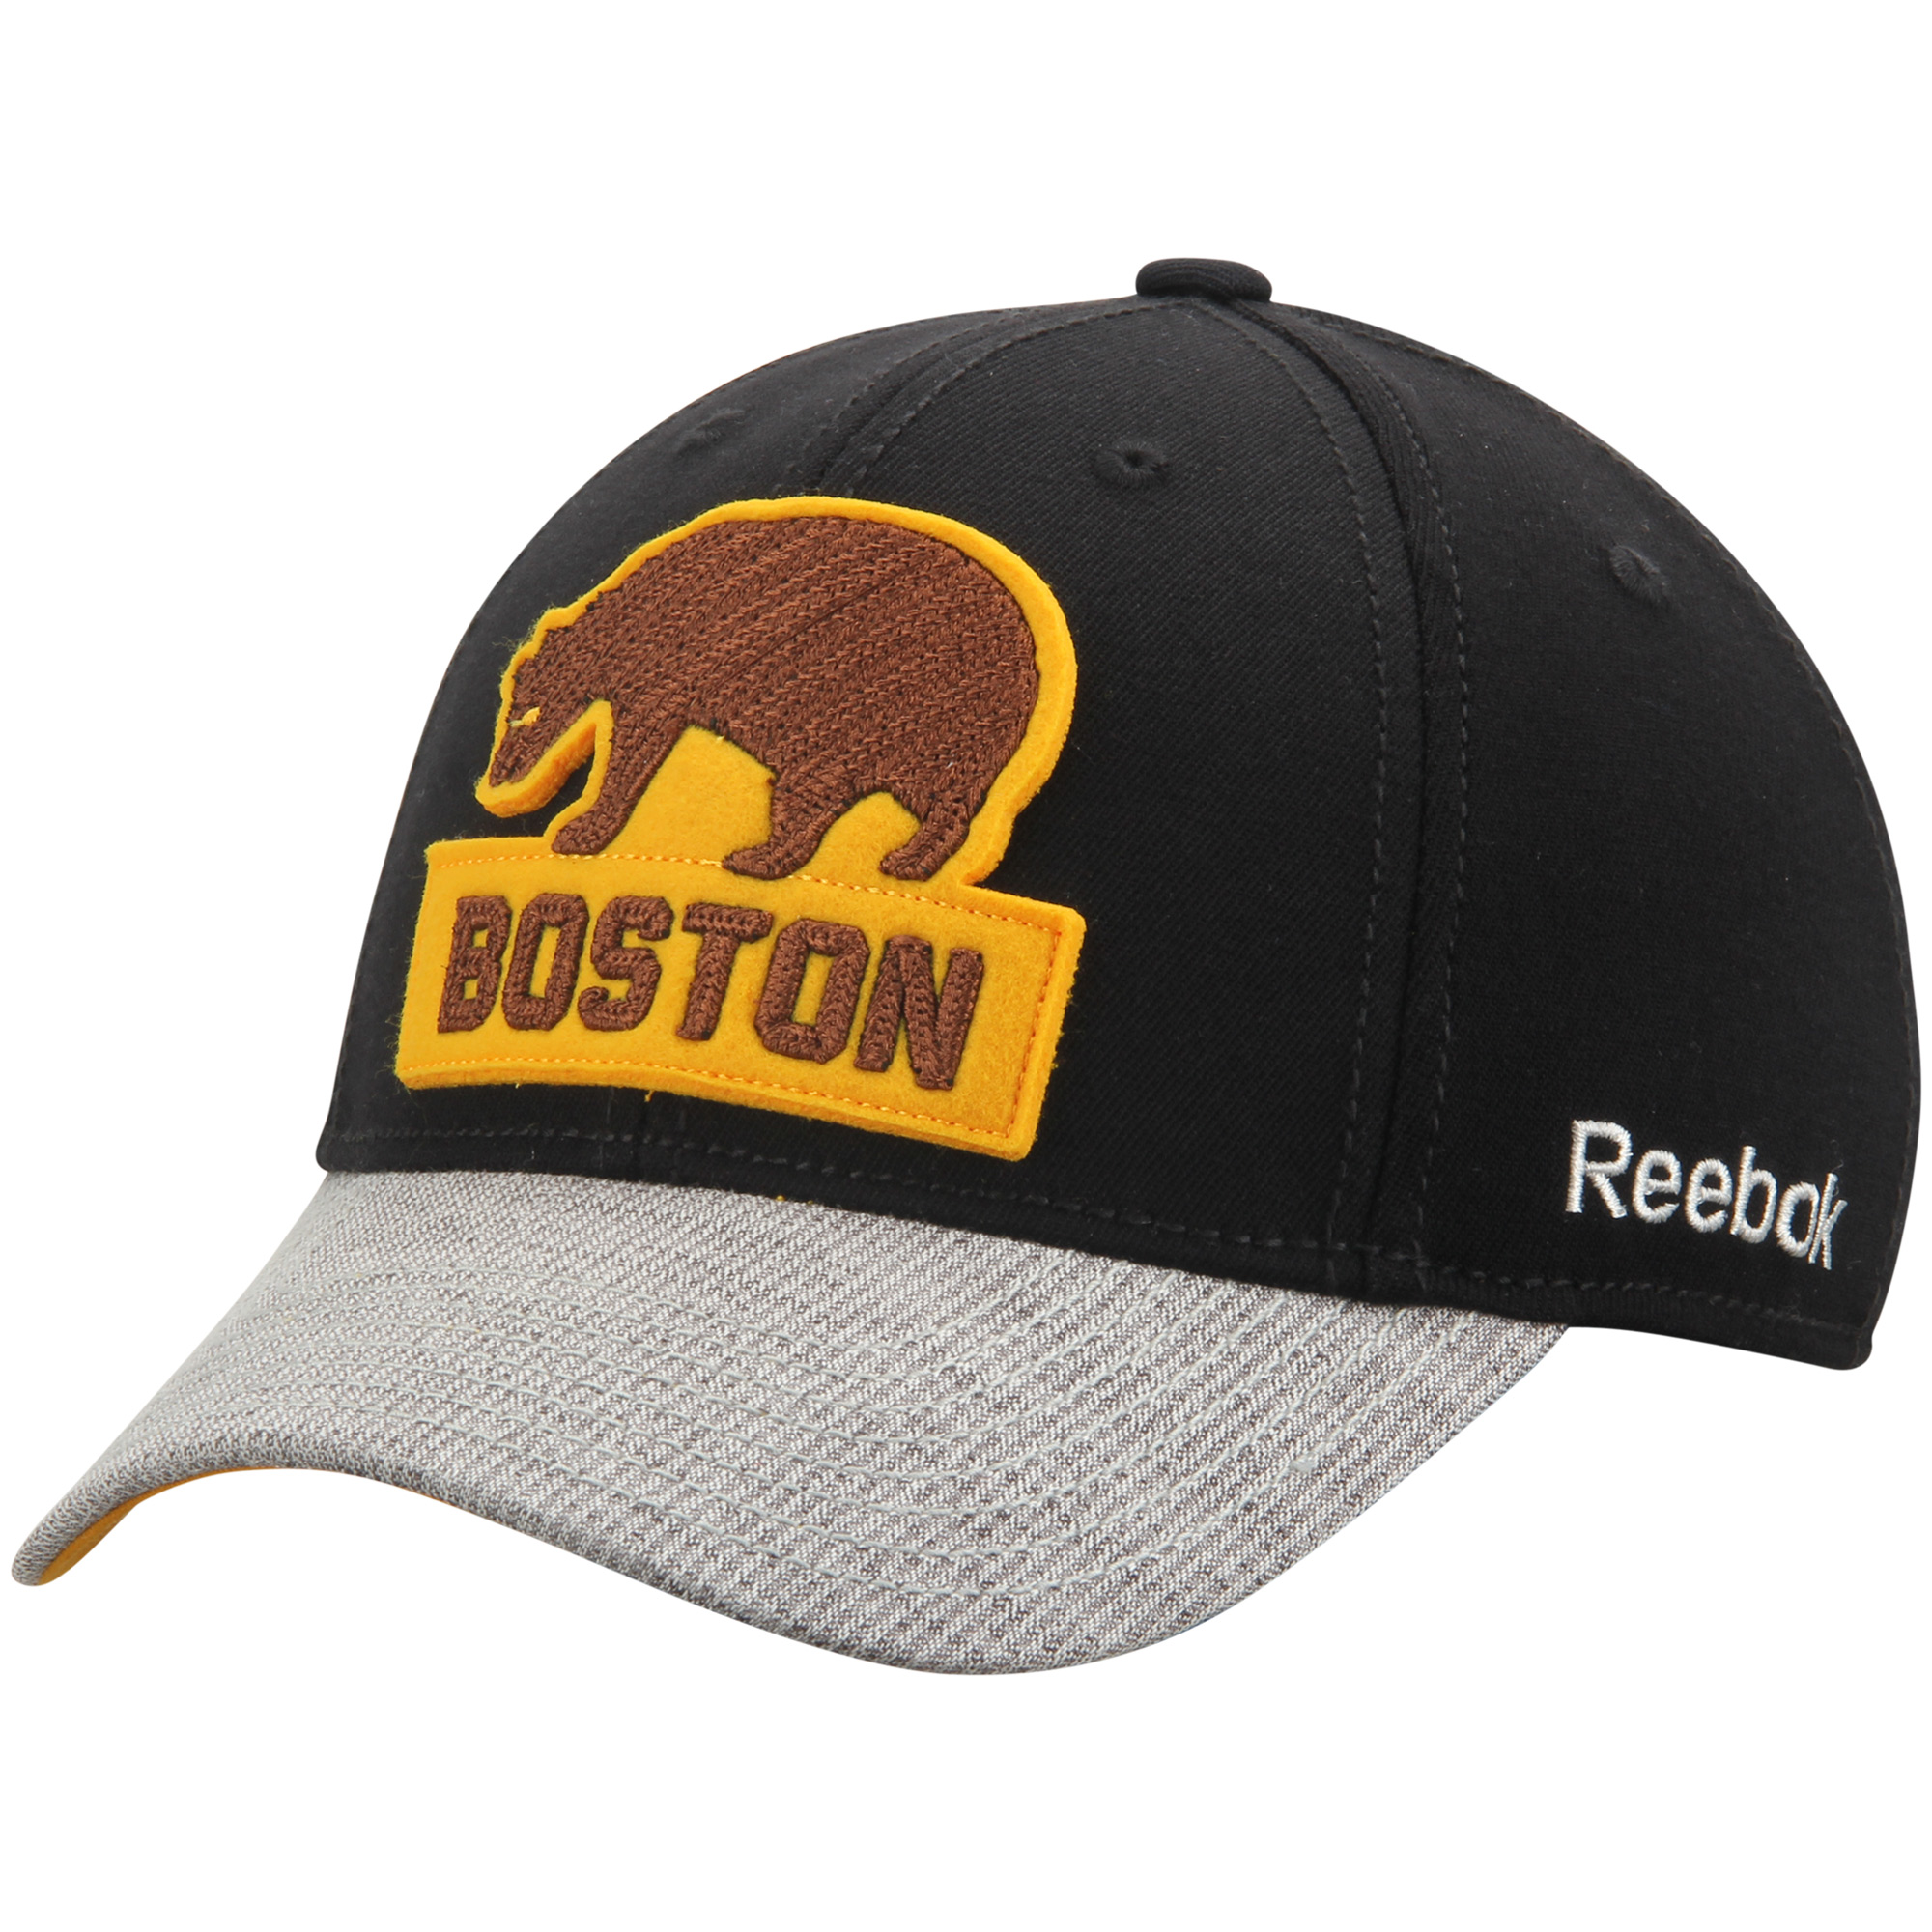 Boston Bruins Reebok 2016 Winter Classic Coaches Flex Hat Black Gray S M by REEBOK/SPORTS LICENSED DIVISION